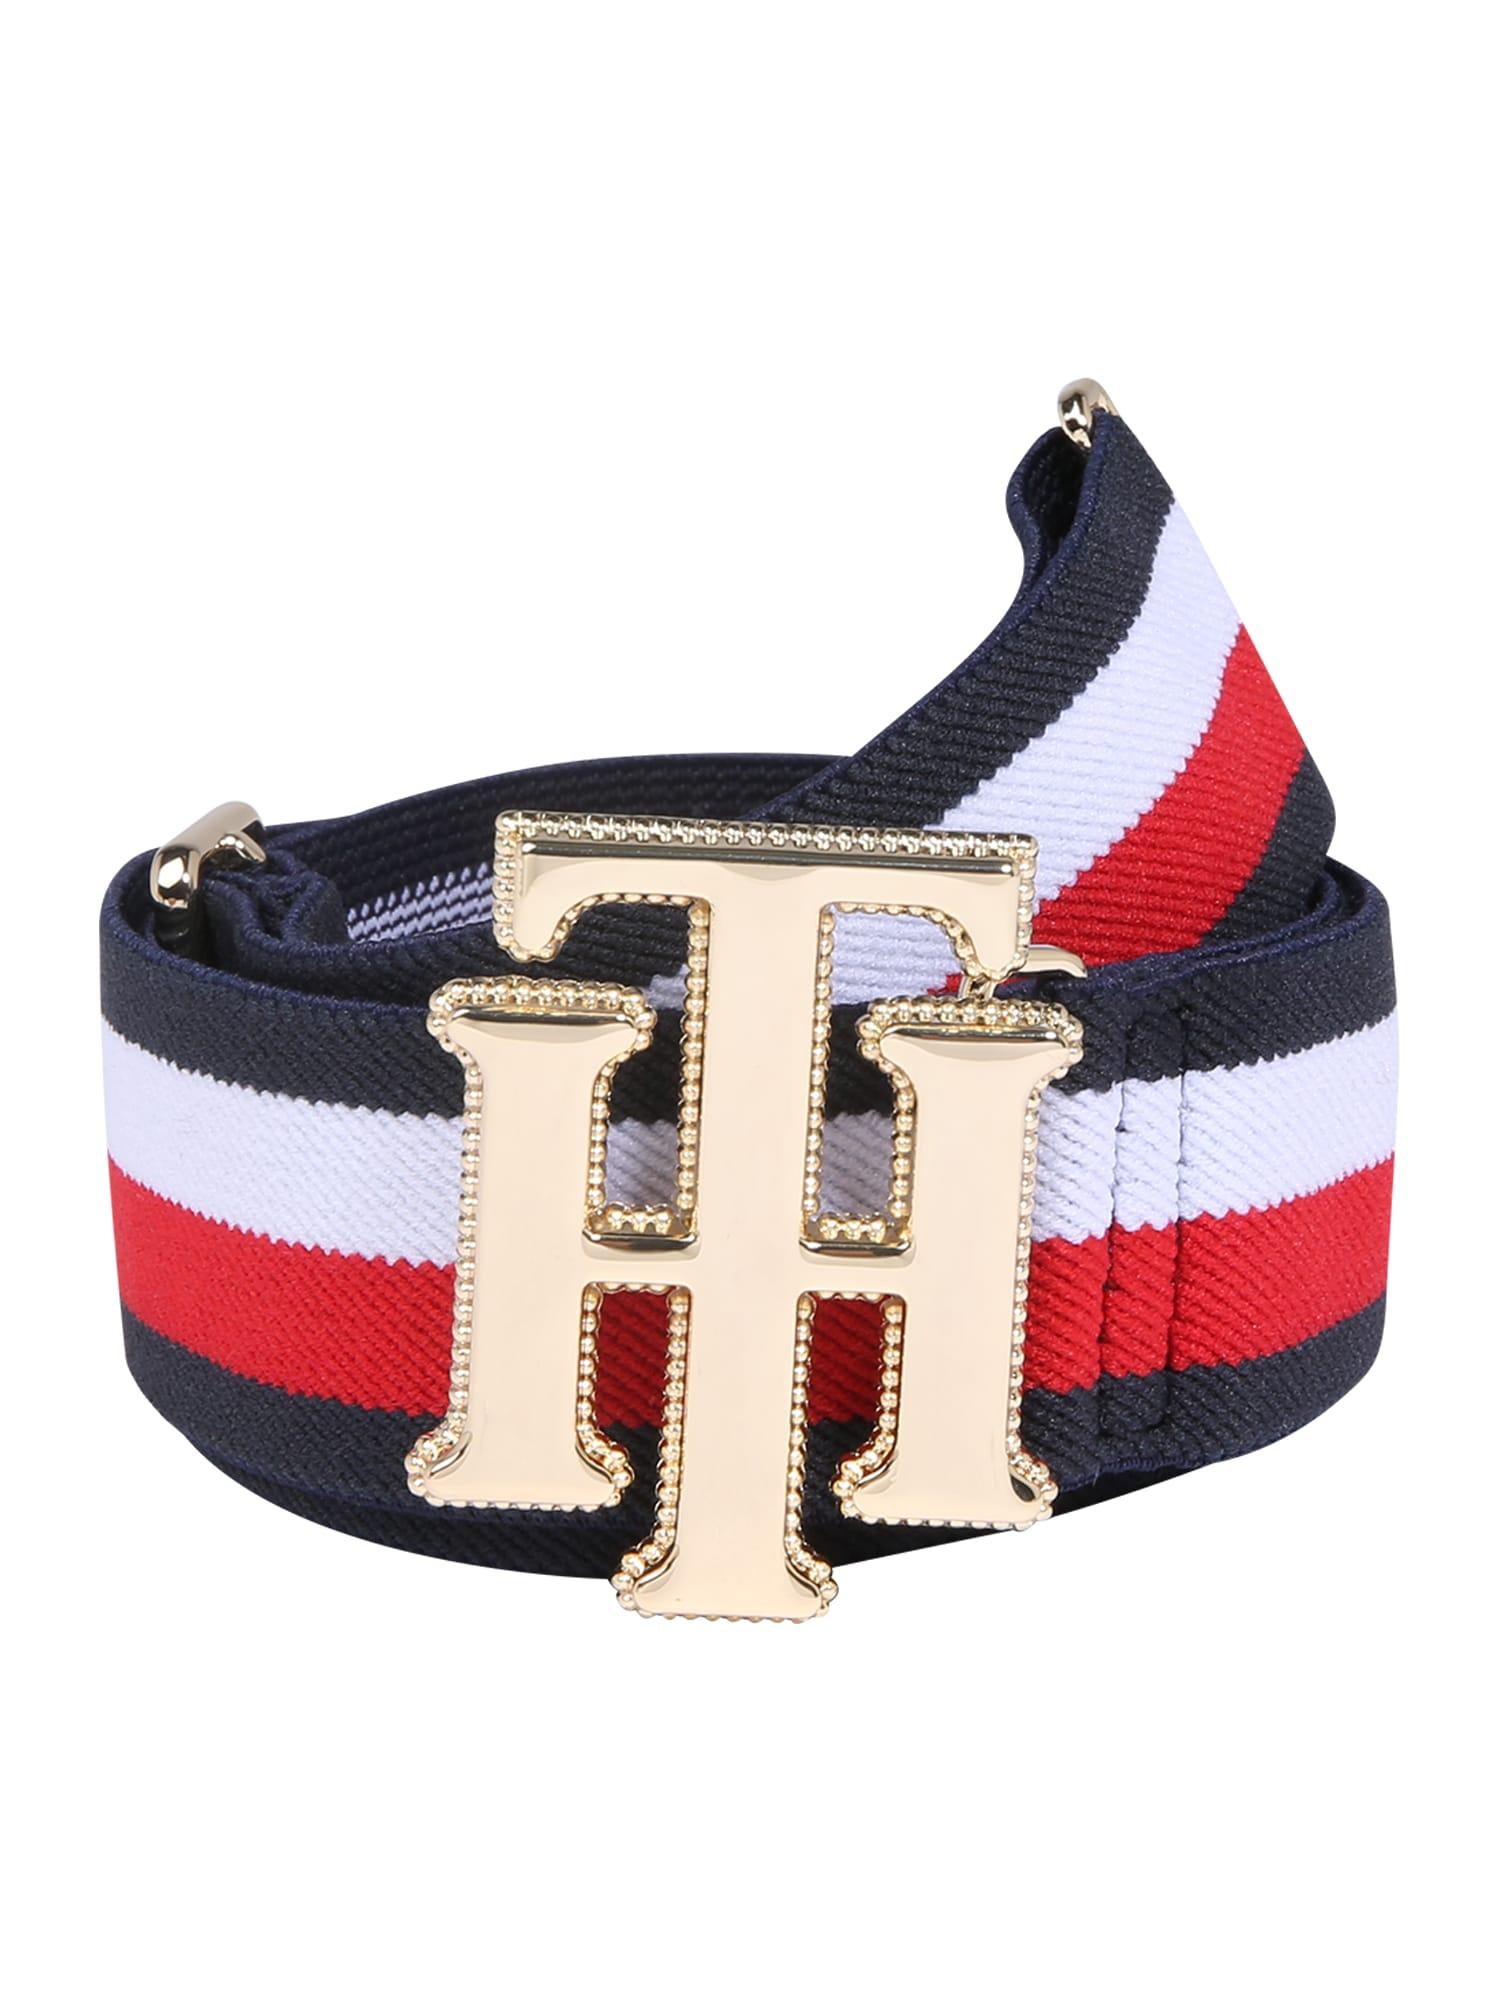 Opasek New Fashion Elastic Belt  tmavě modrá červená bílá TOMMY HILFIGER